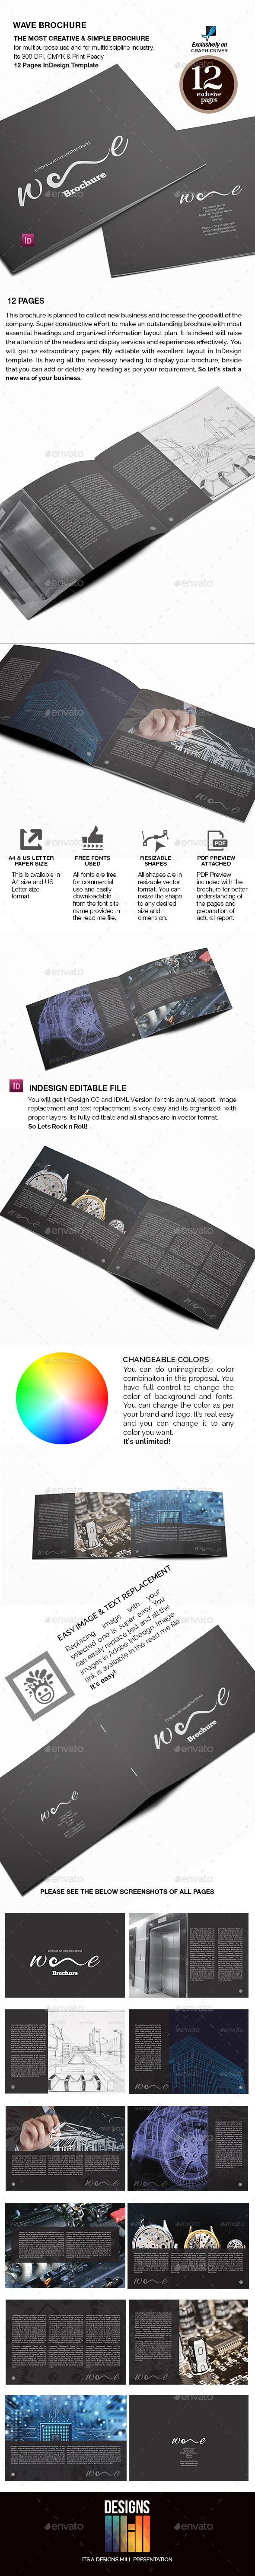 GraphicRiver Wave Landscape Brochure 9241108